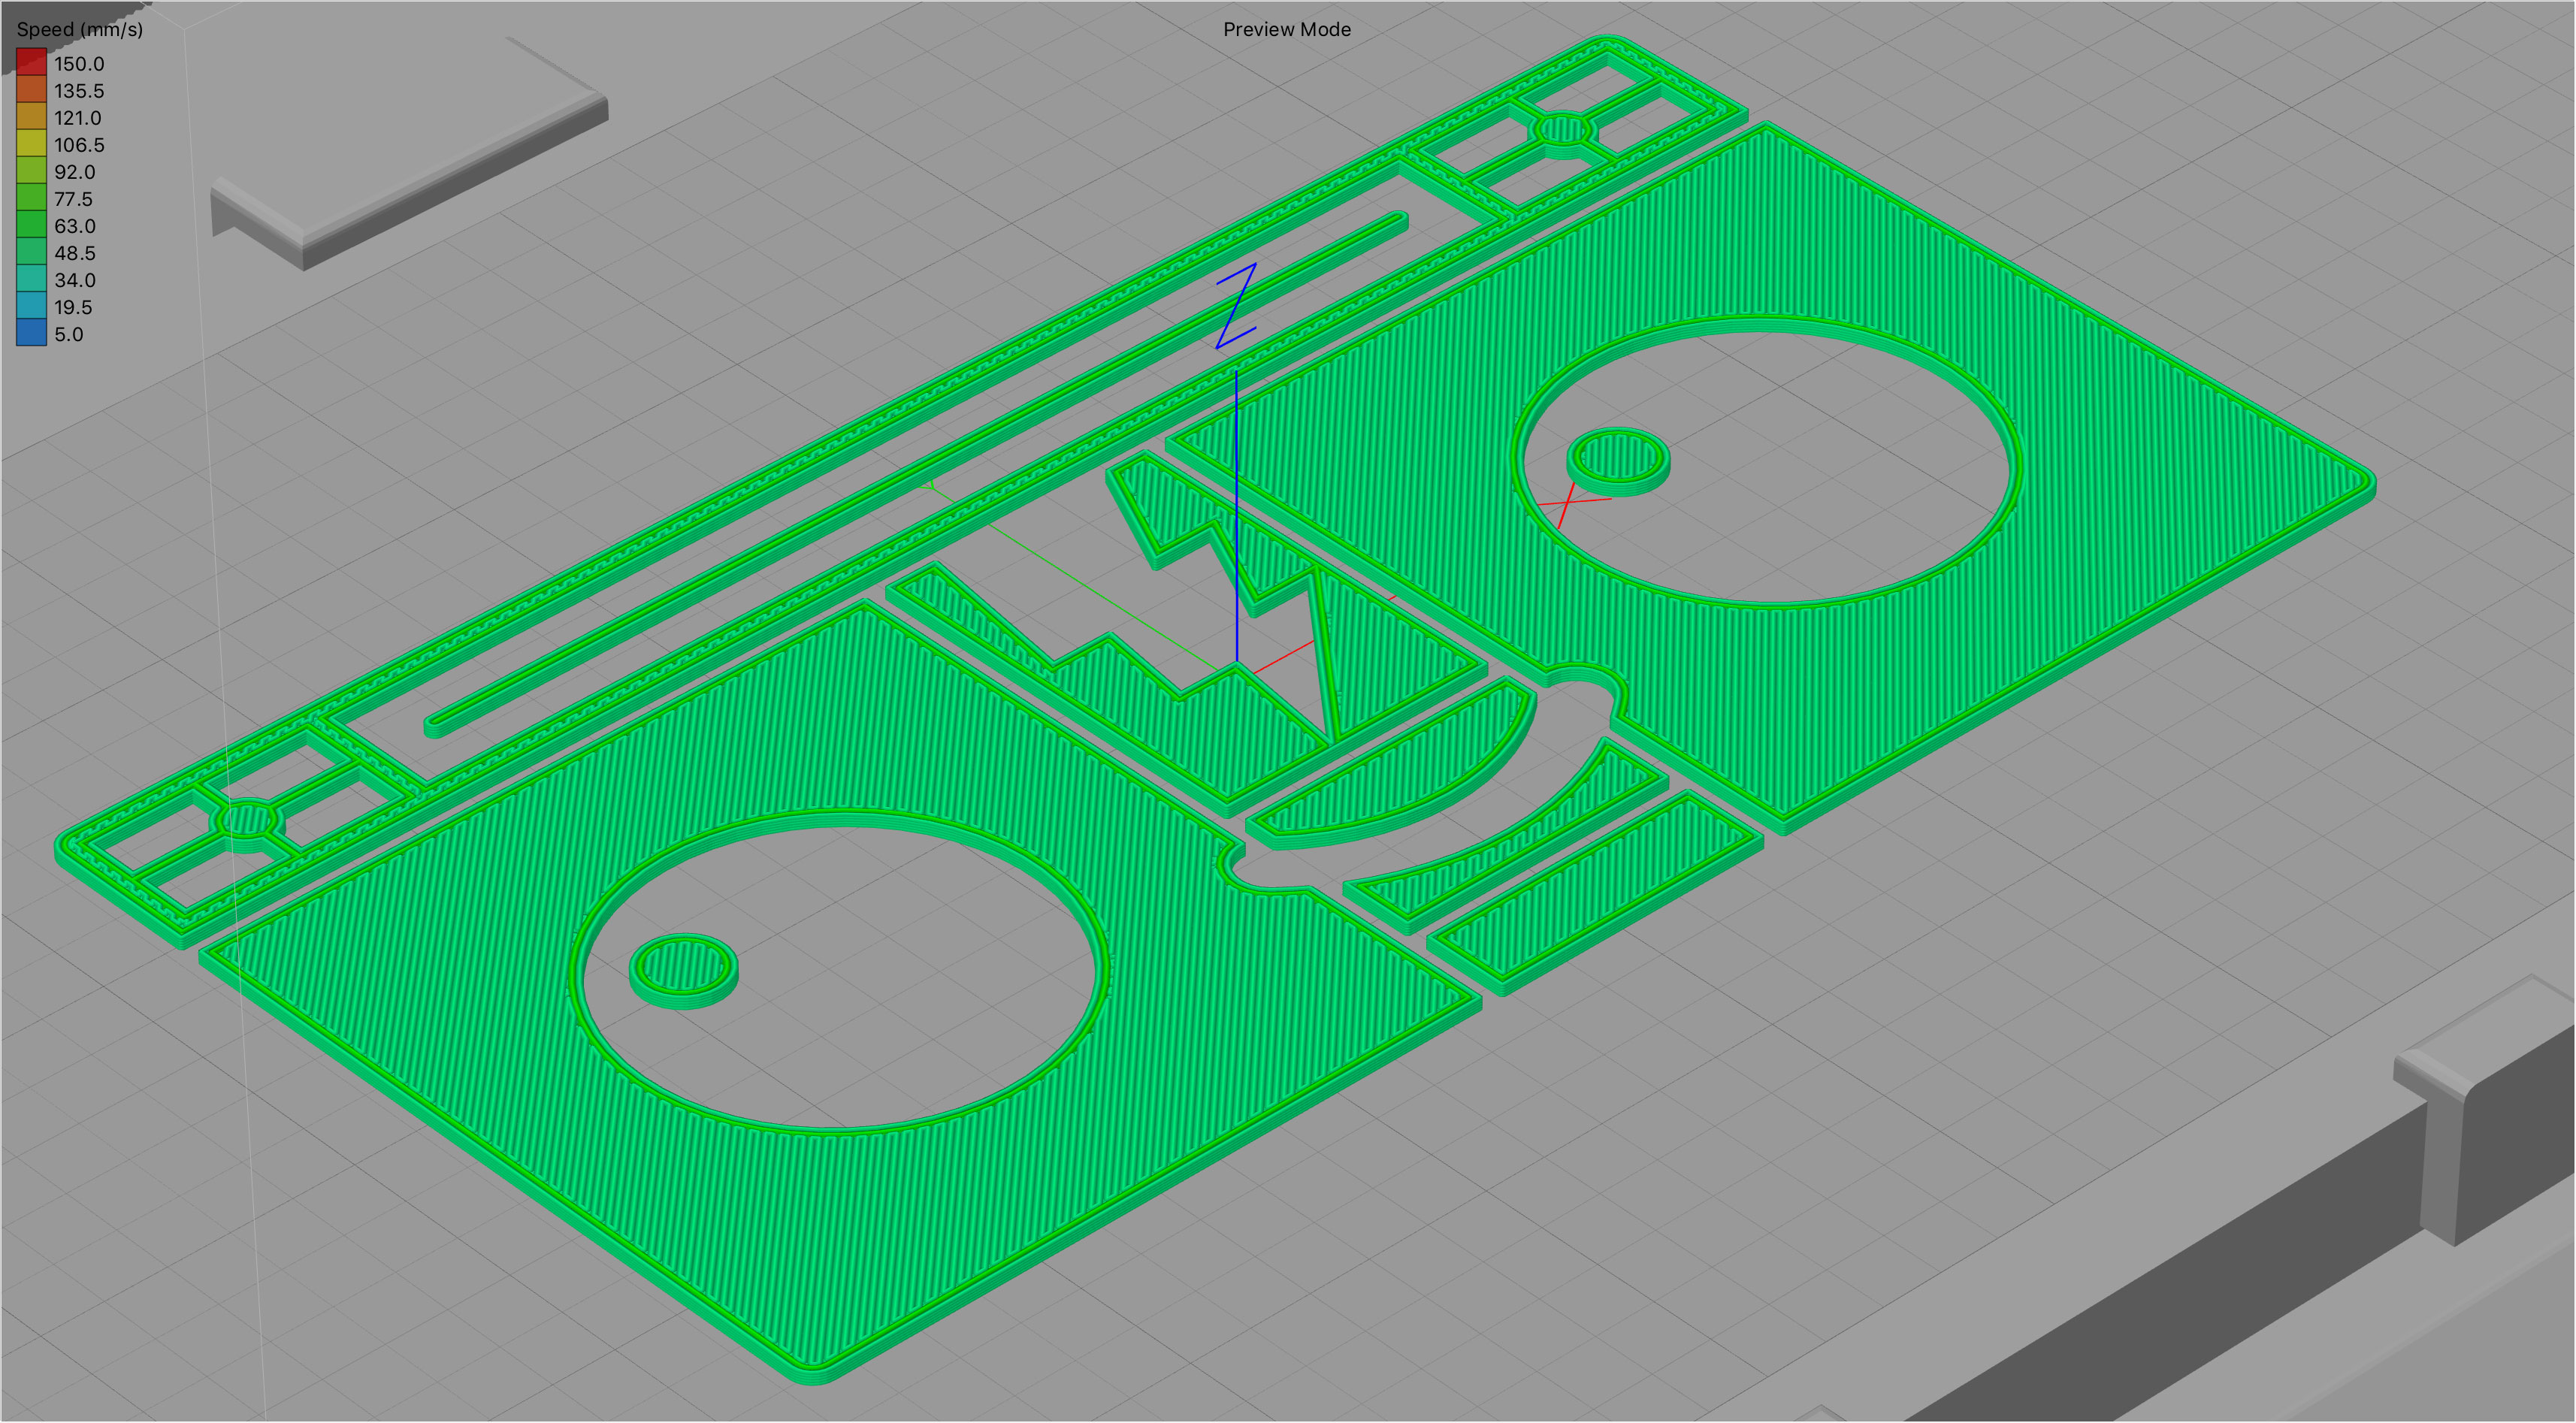 3d_printing_gcode-preview.jpg